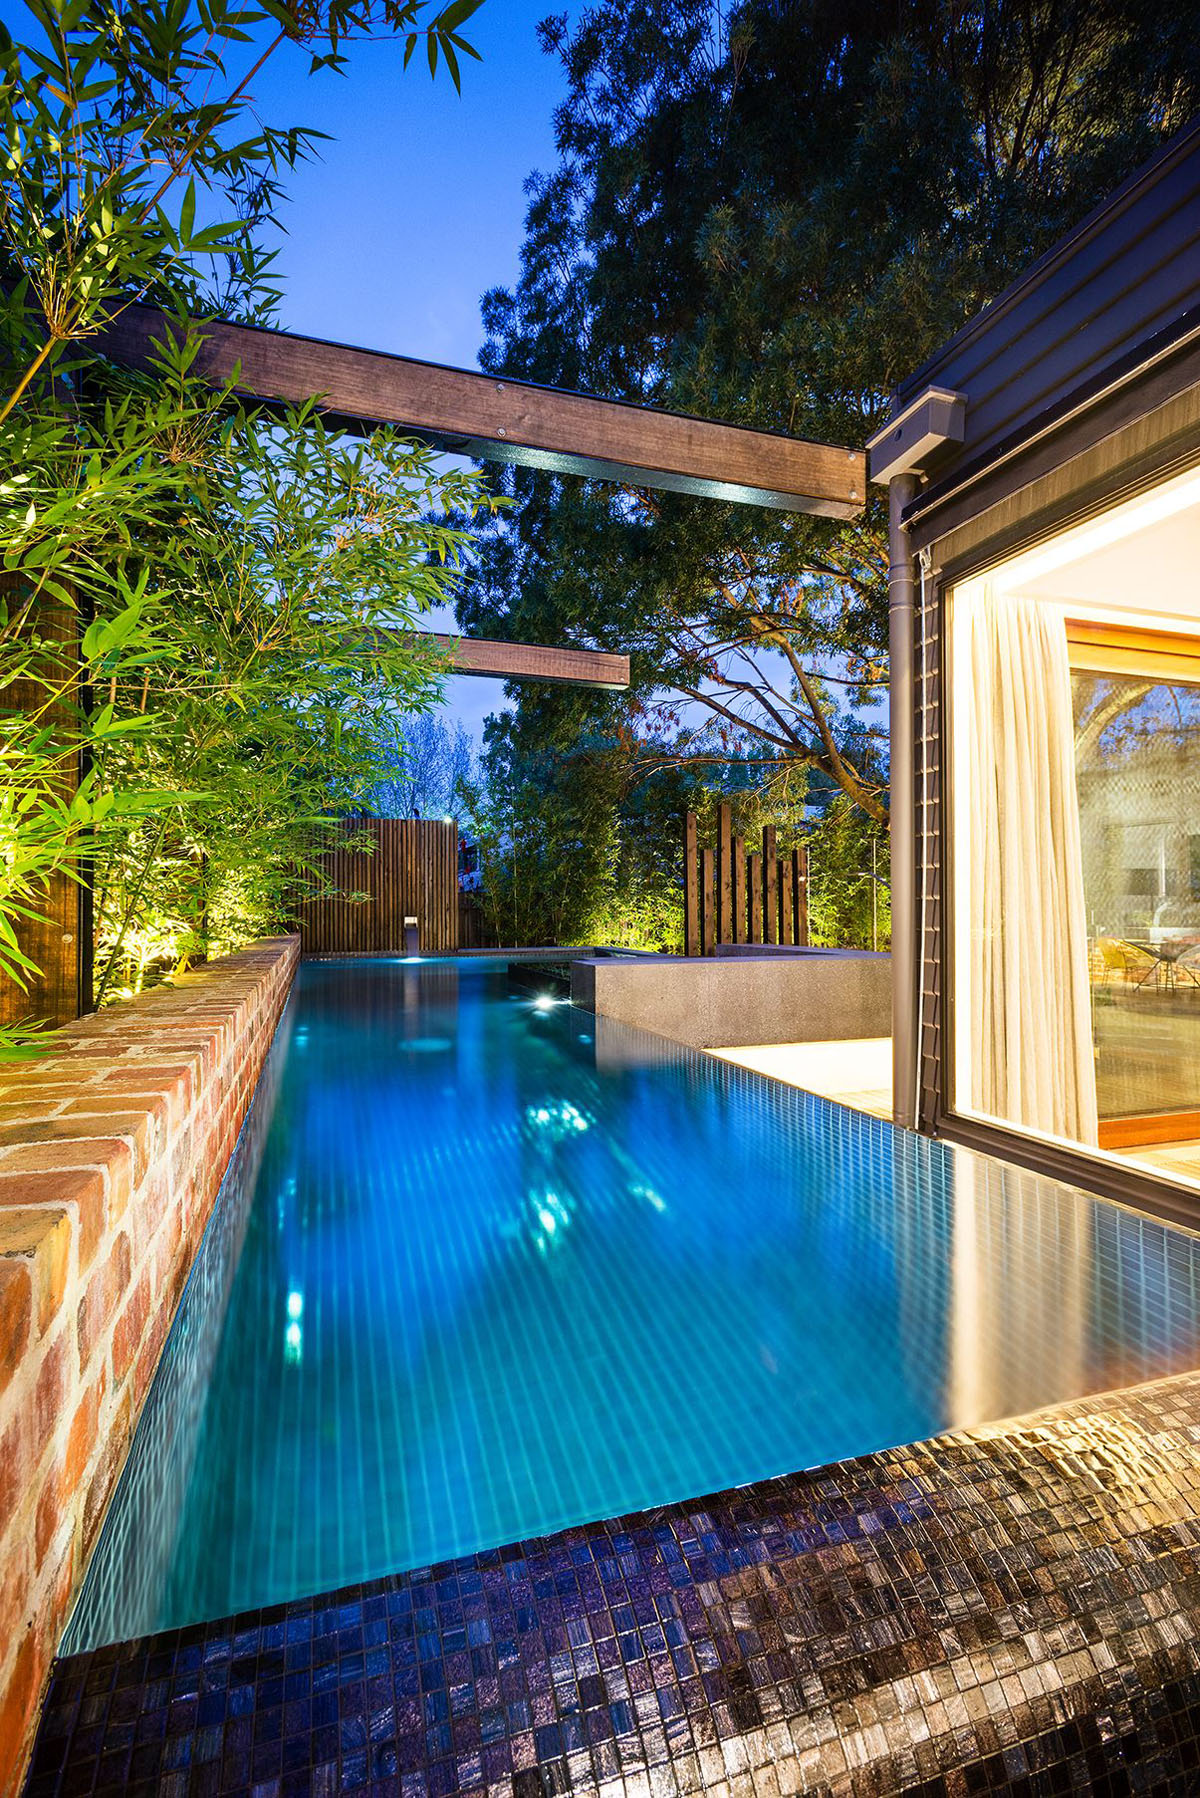 Inspiring Modern Backyard Ideas to Relax You at Home ... on Modern Backyard Ideas With Pool id=78517